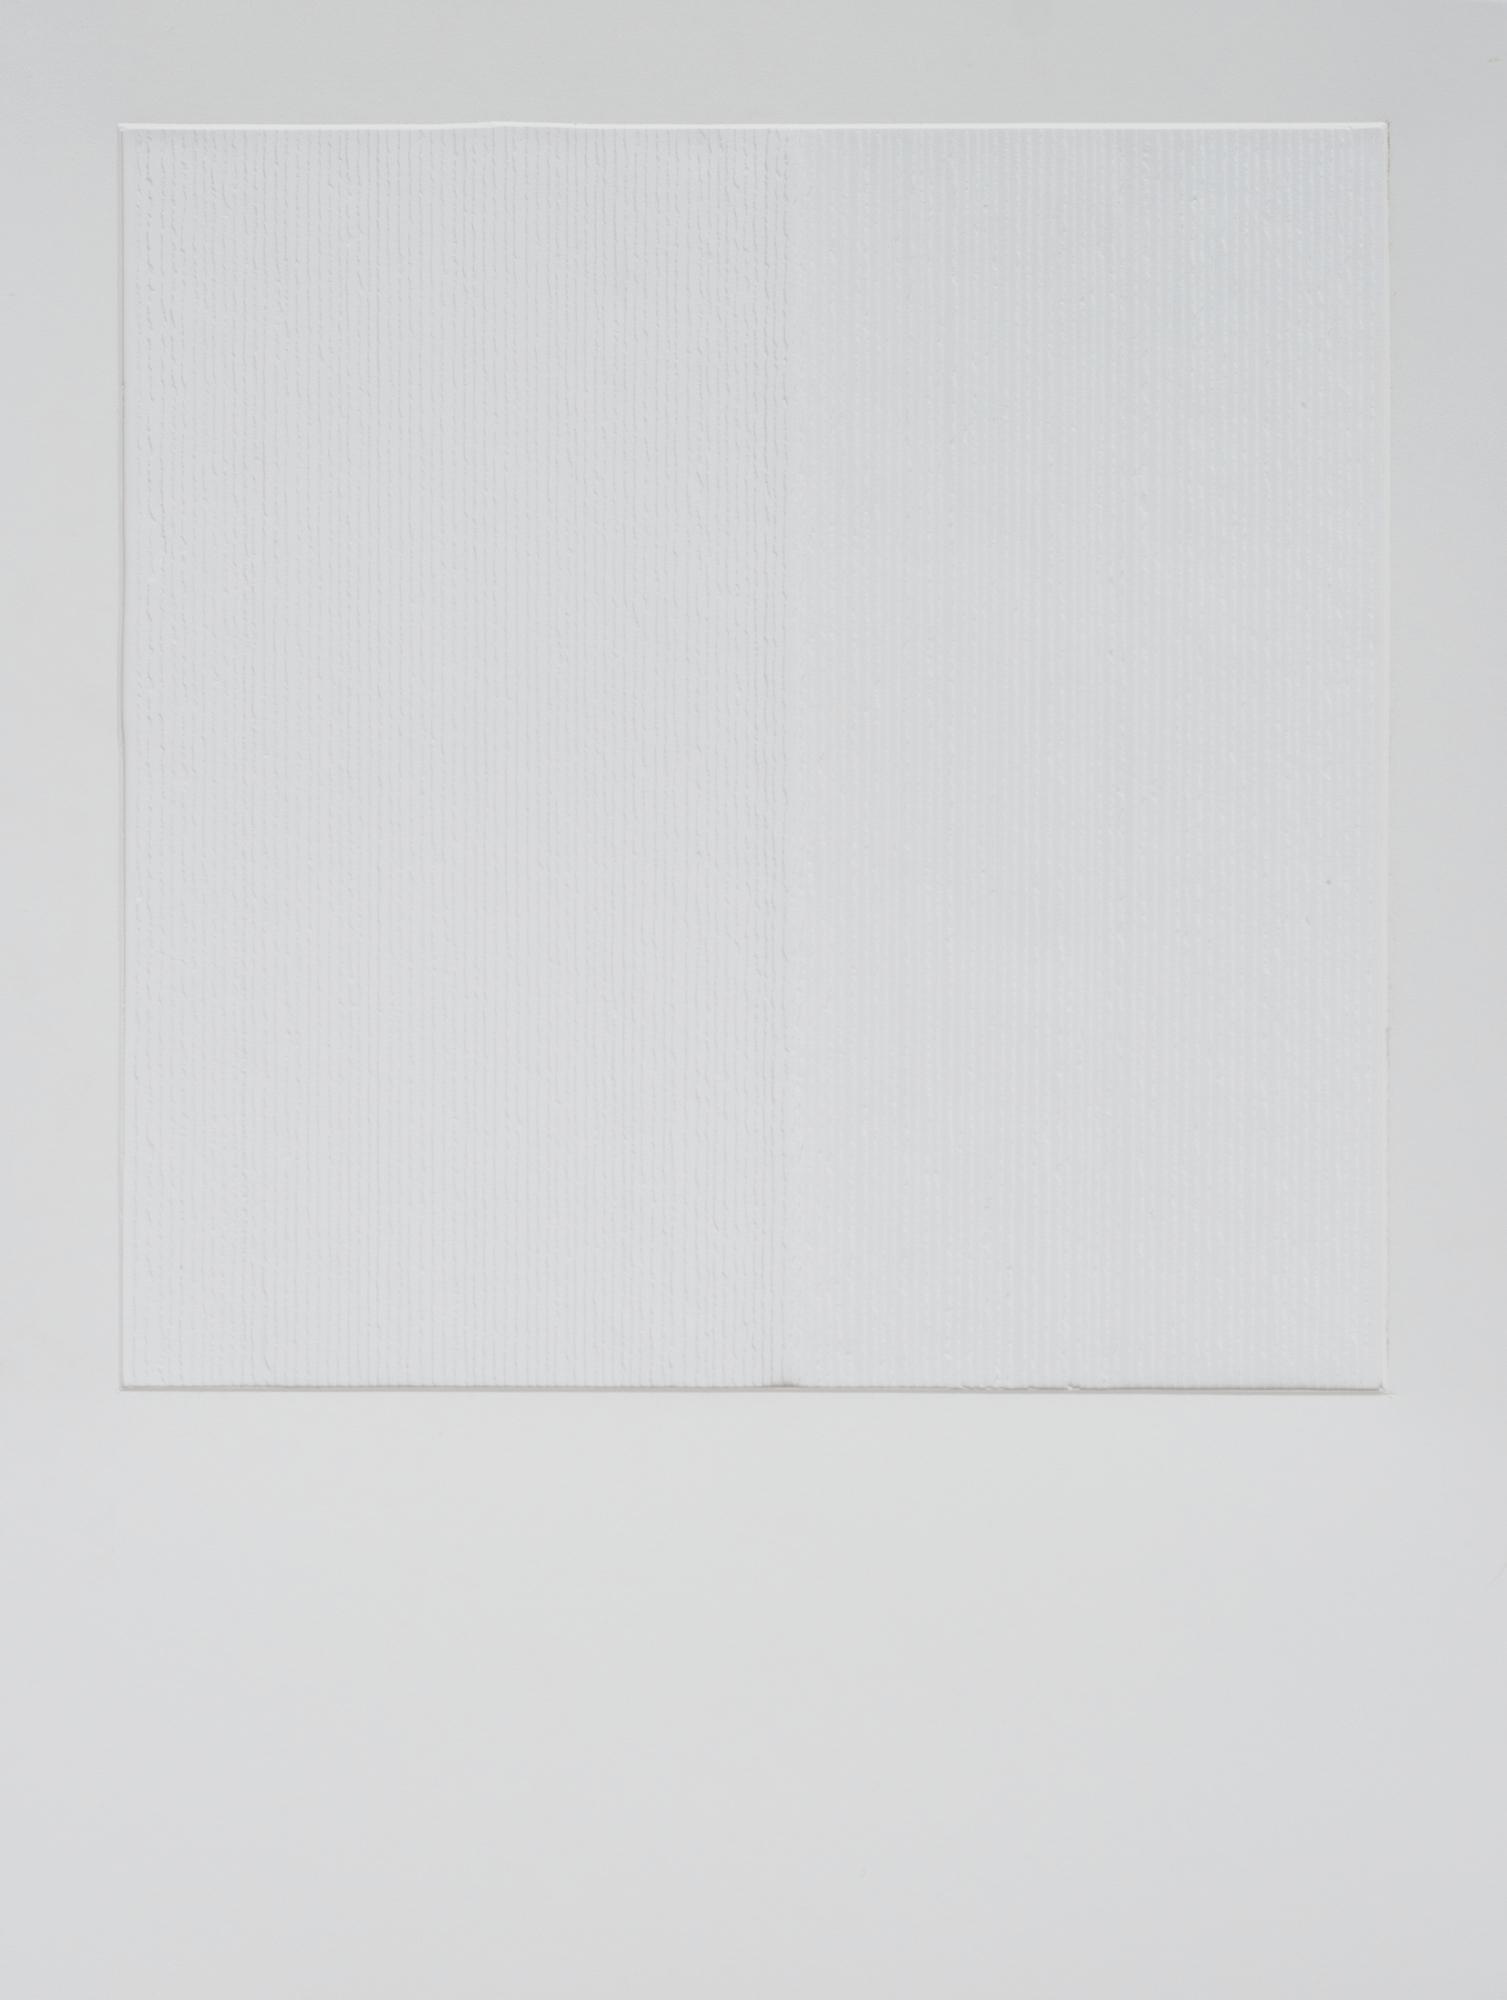 Moes_Galerie_Zavodny_1.jpg